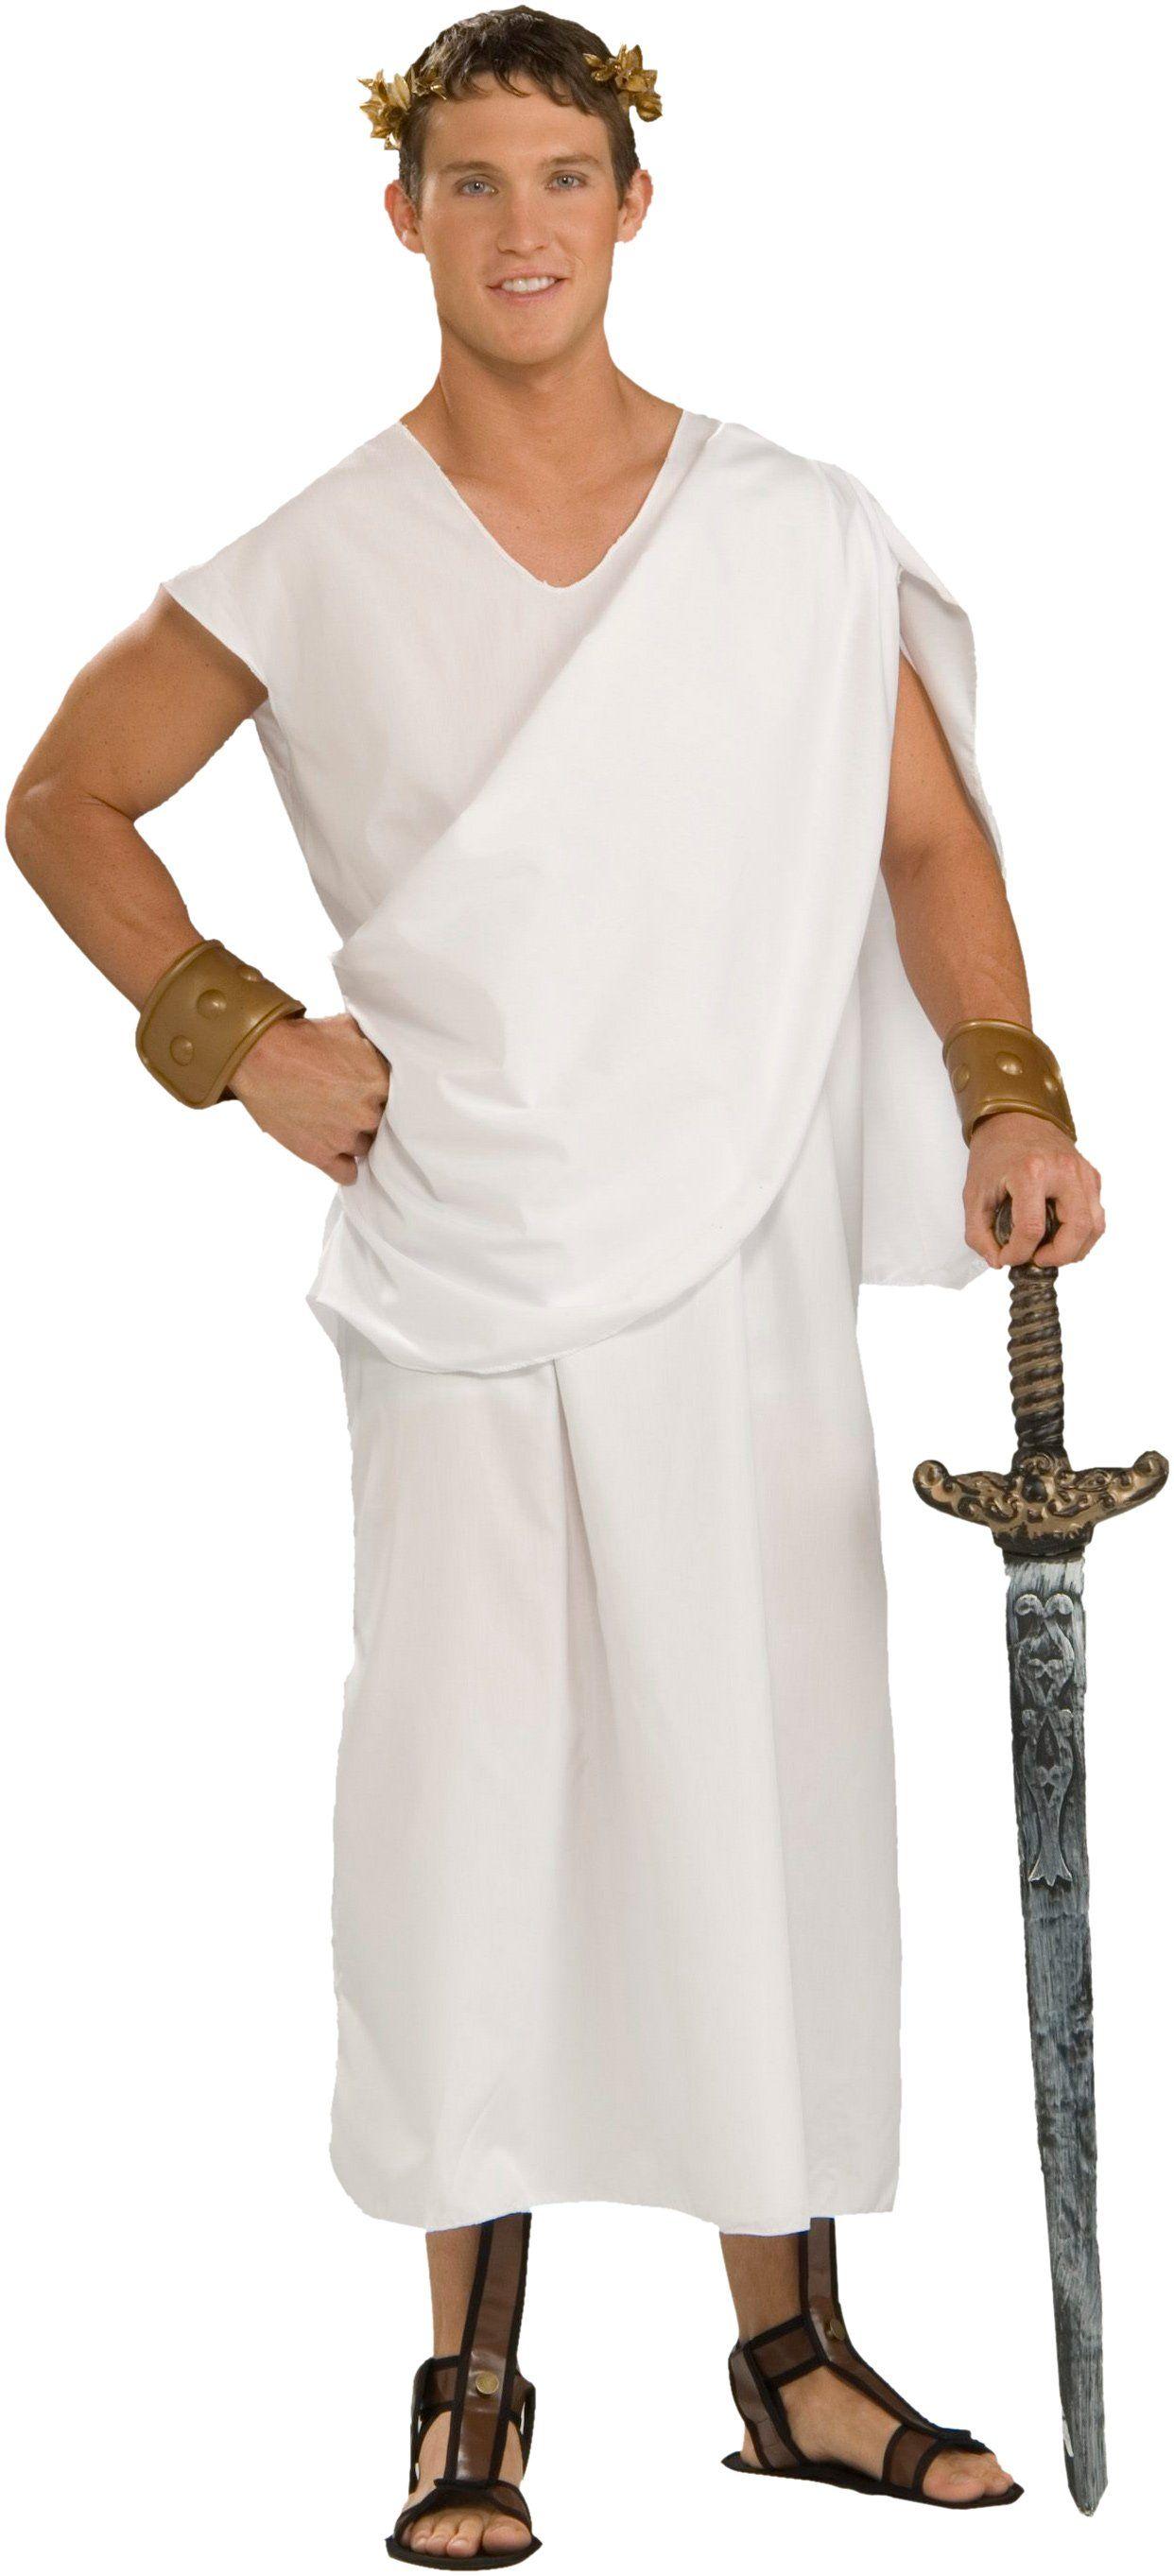 Deluxe classic toga male adult costume toga costume costumes deluxe classic toga male adult costume solutioingenieria Images